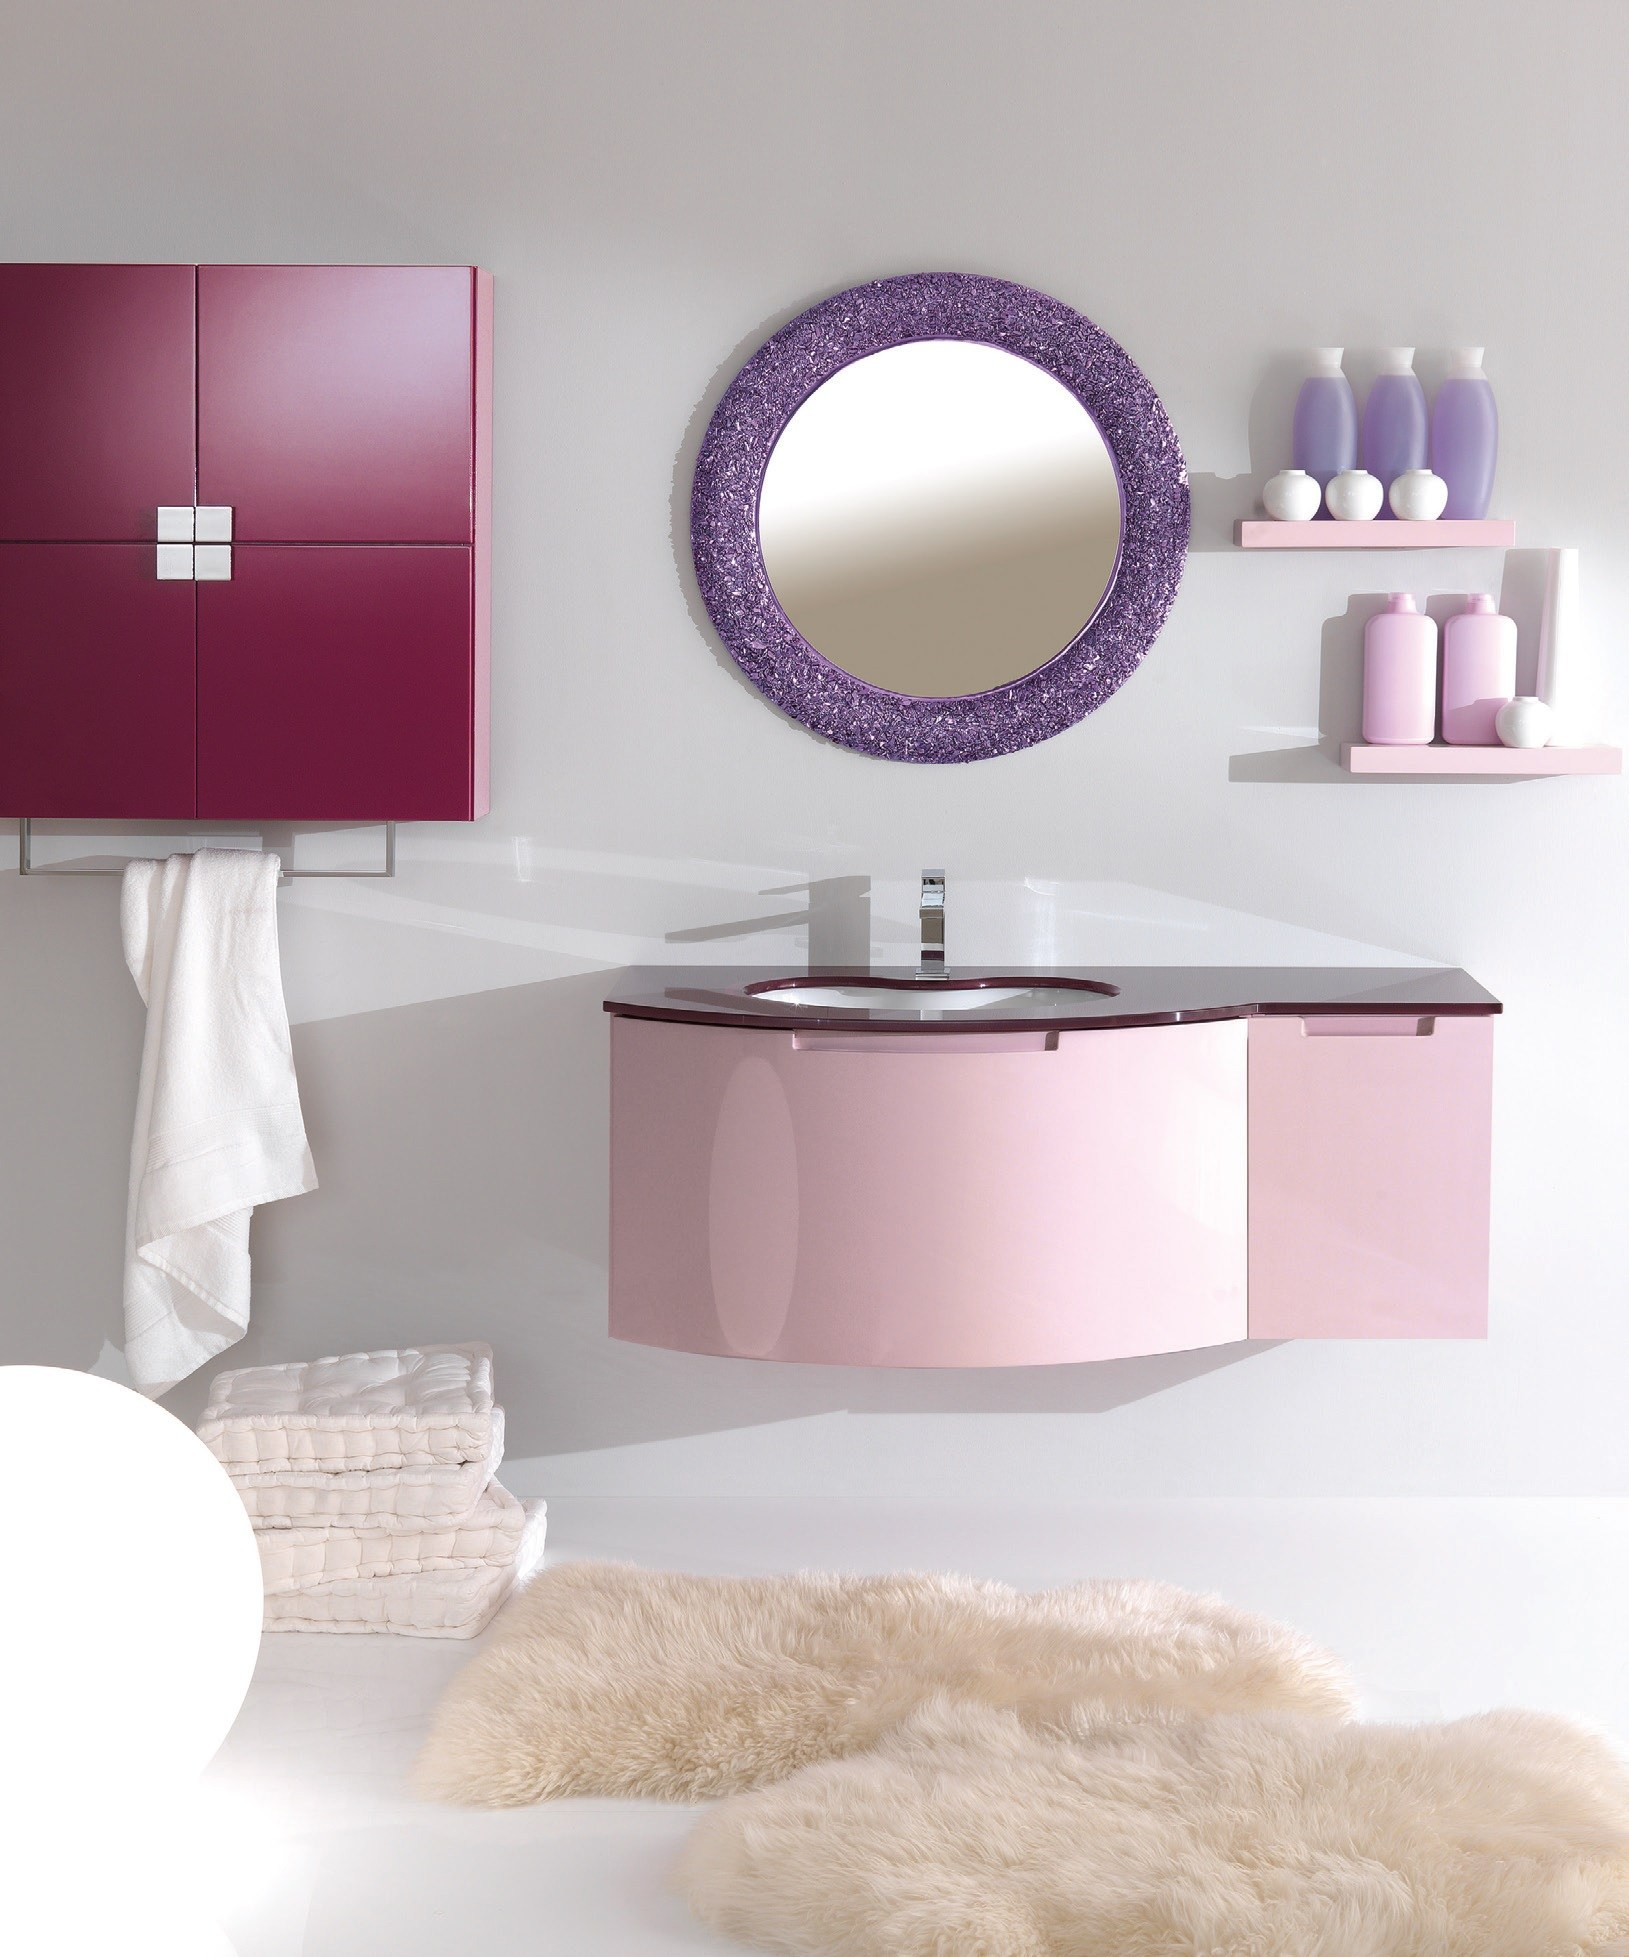 Miroir pour salle de bain glove 1 by lasa idea for Miroir pour salle de bain